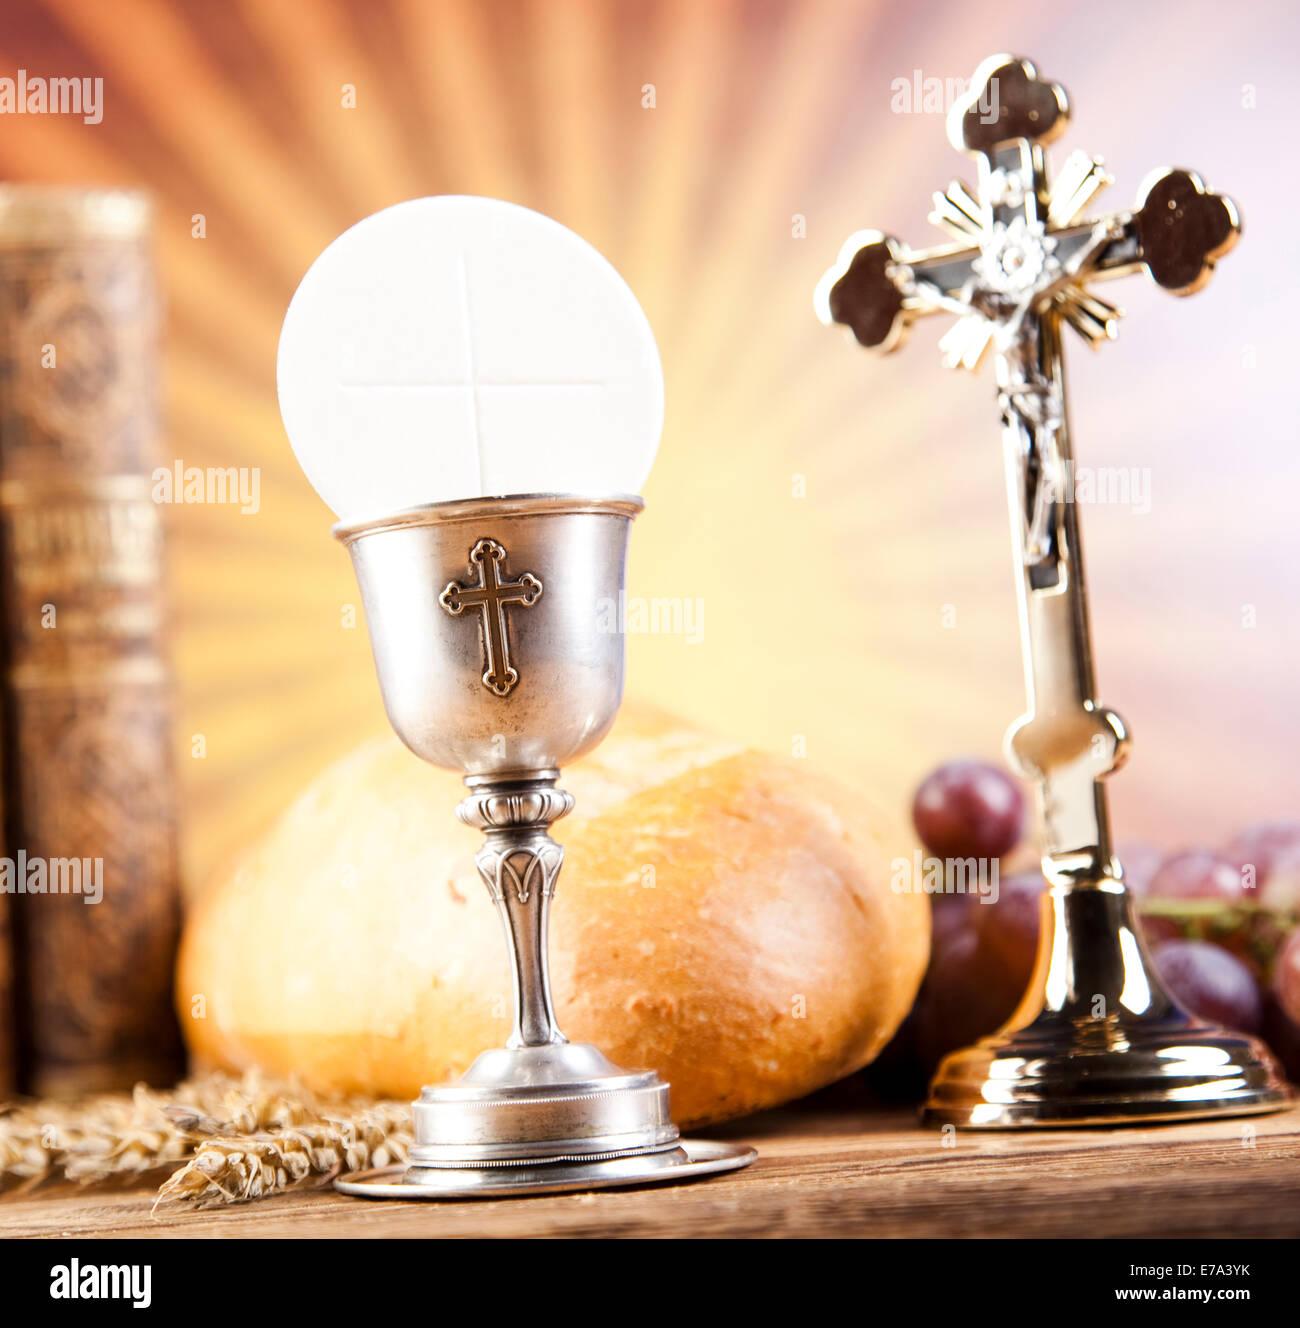 holy communion bread wine stock photo 73366711 alamy